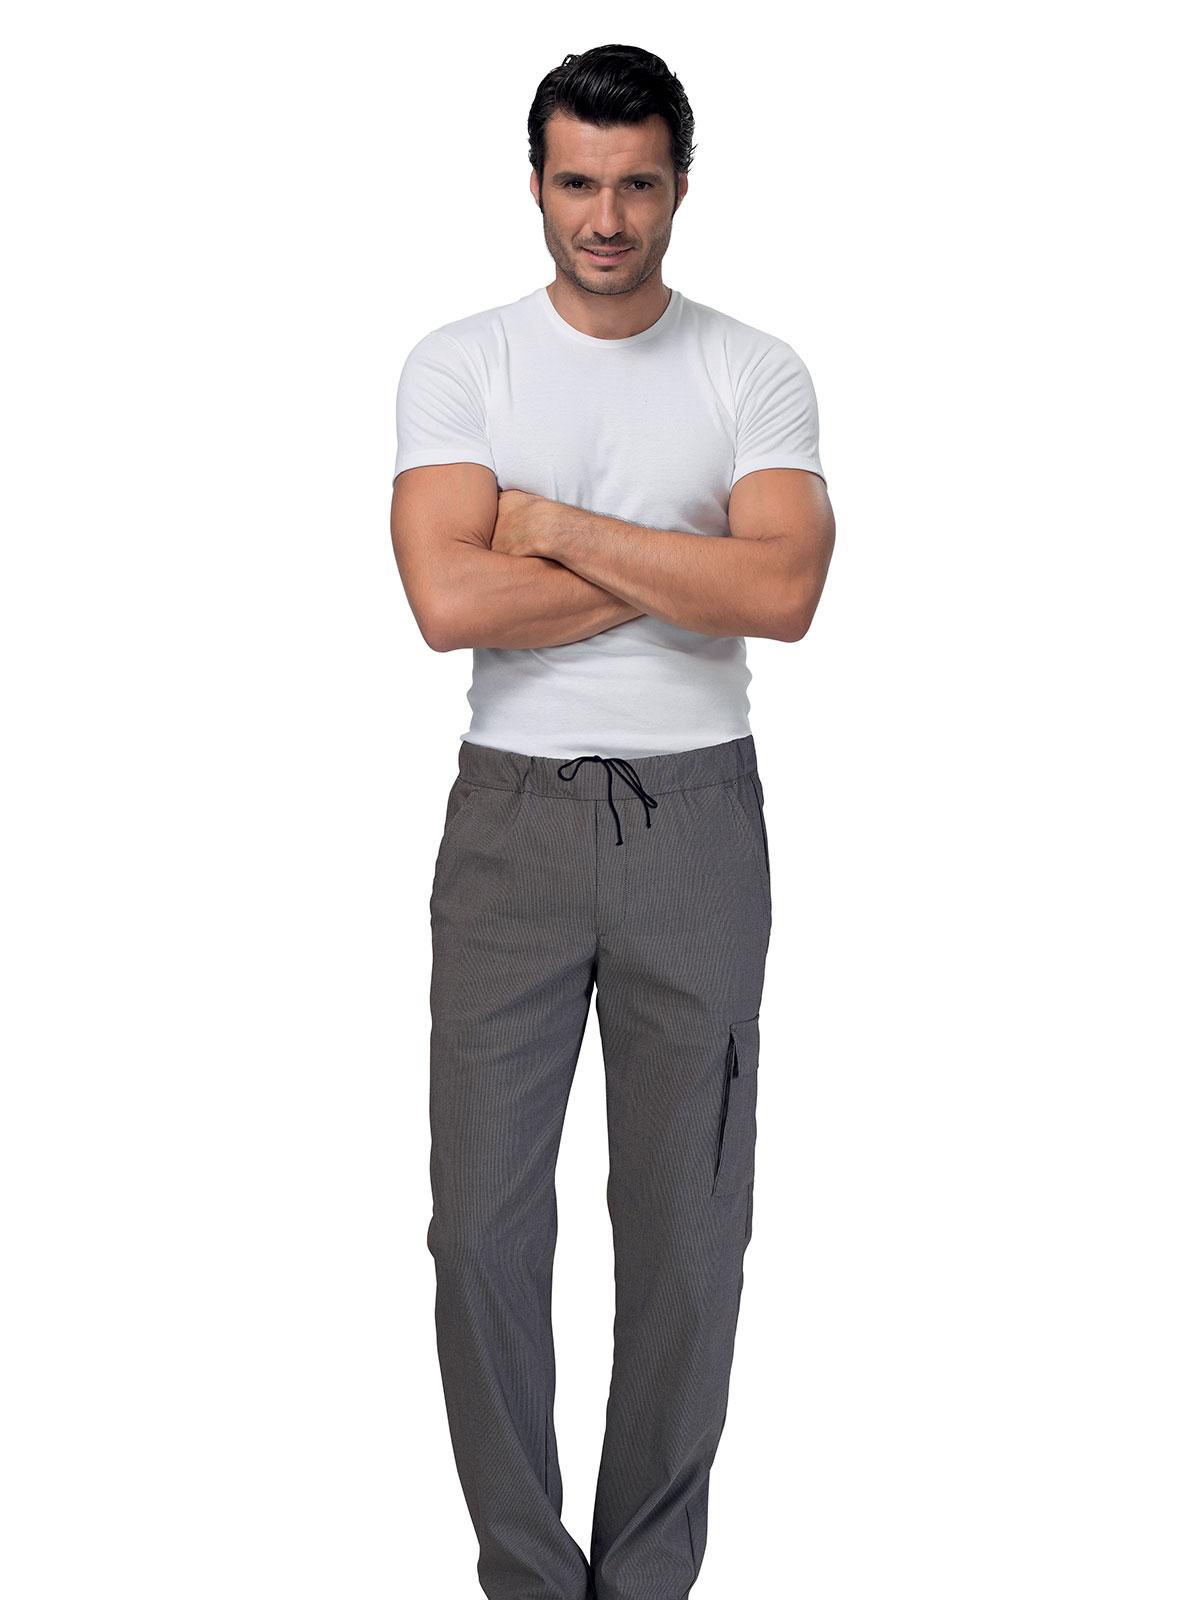 pantaloni da cucina   look da cucina   abbigliamento da lavoro - Pantaloni Da Cucina